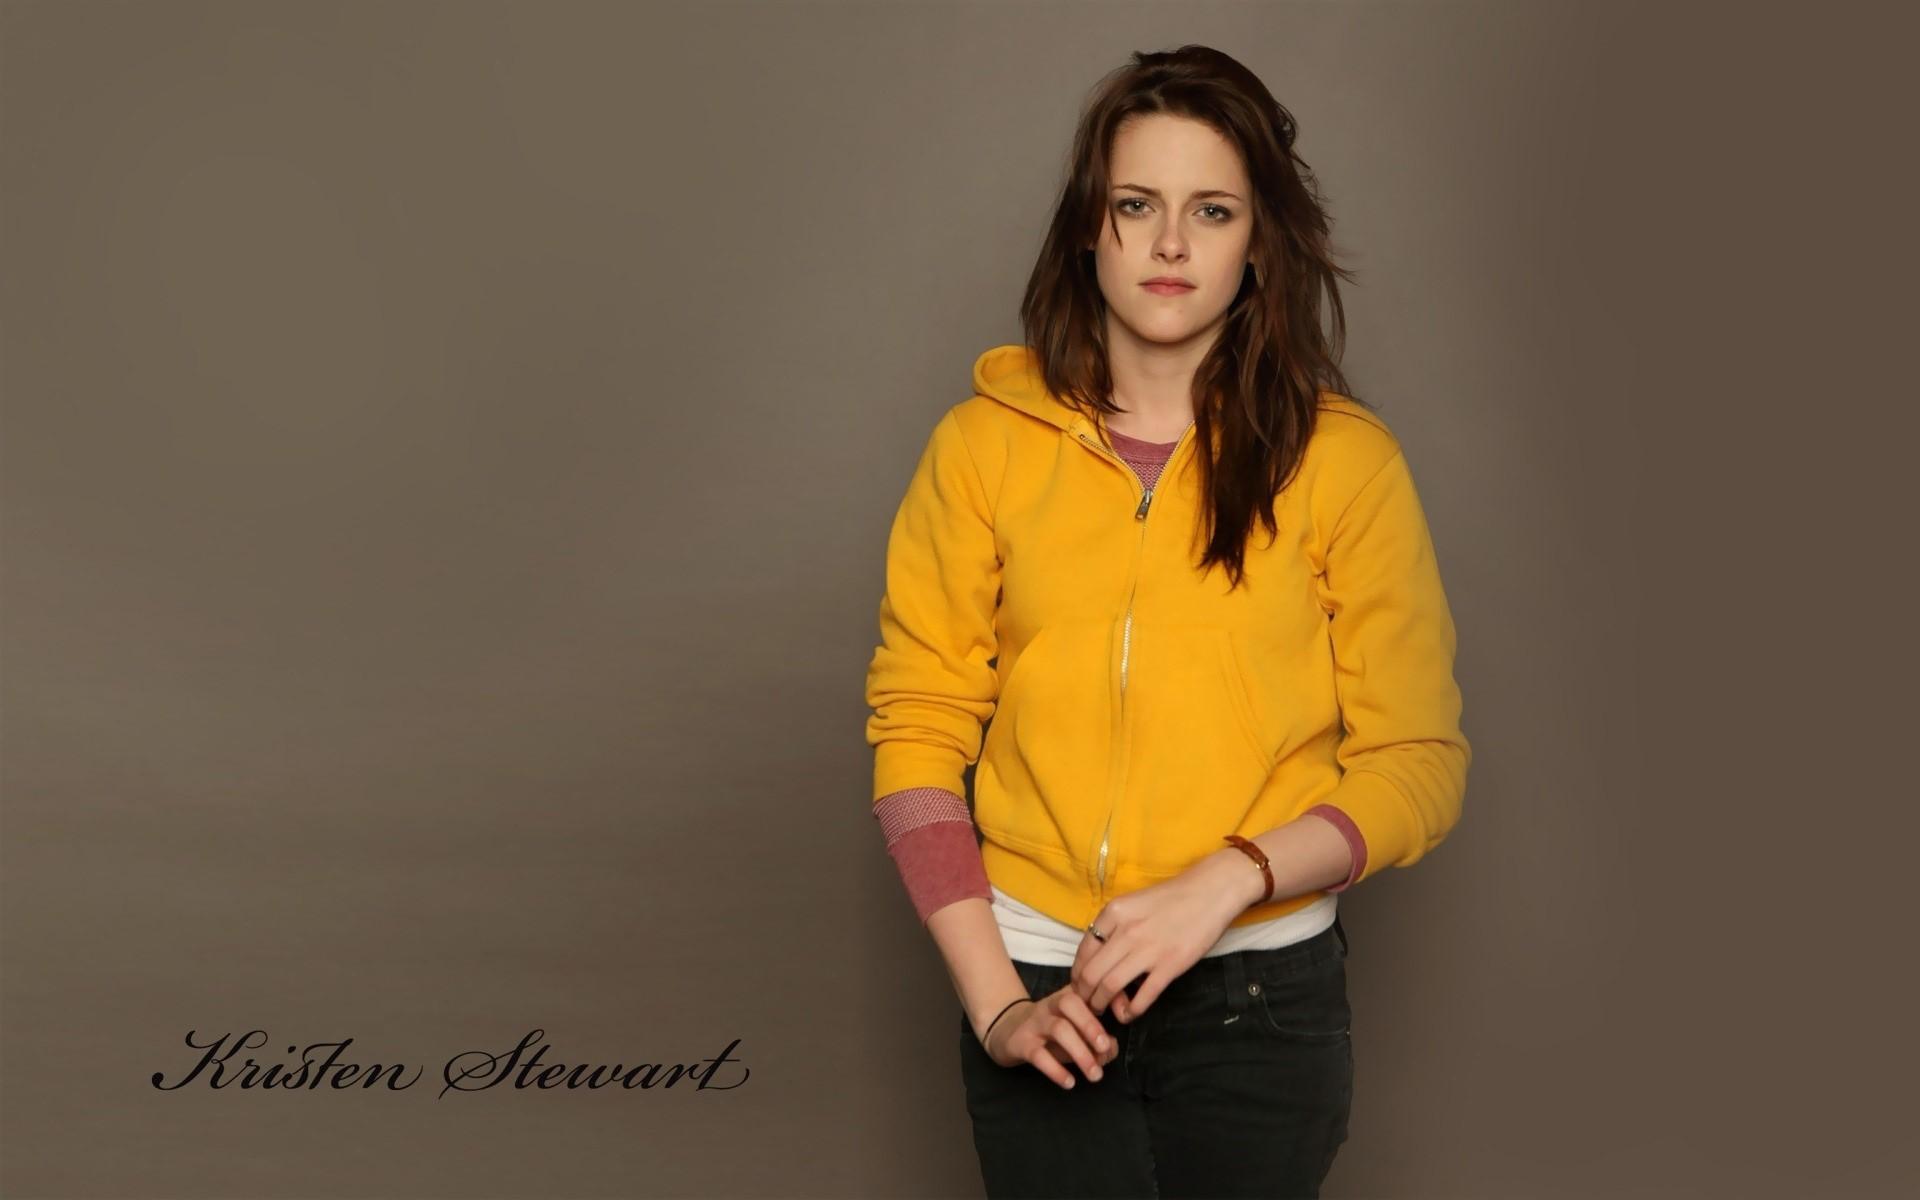 Kristen Stewart Beautiful Hollywood Actress in Yellow HD Wallpapers 1920x1200